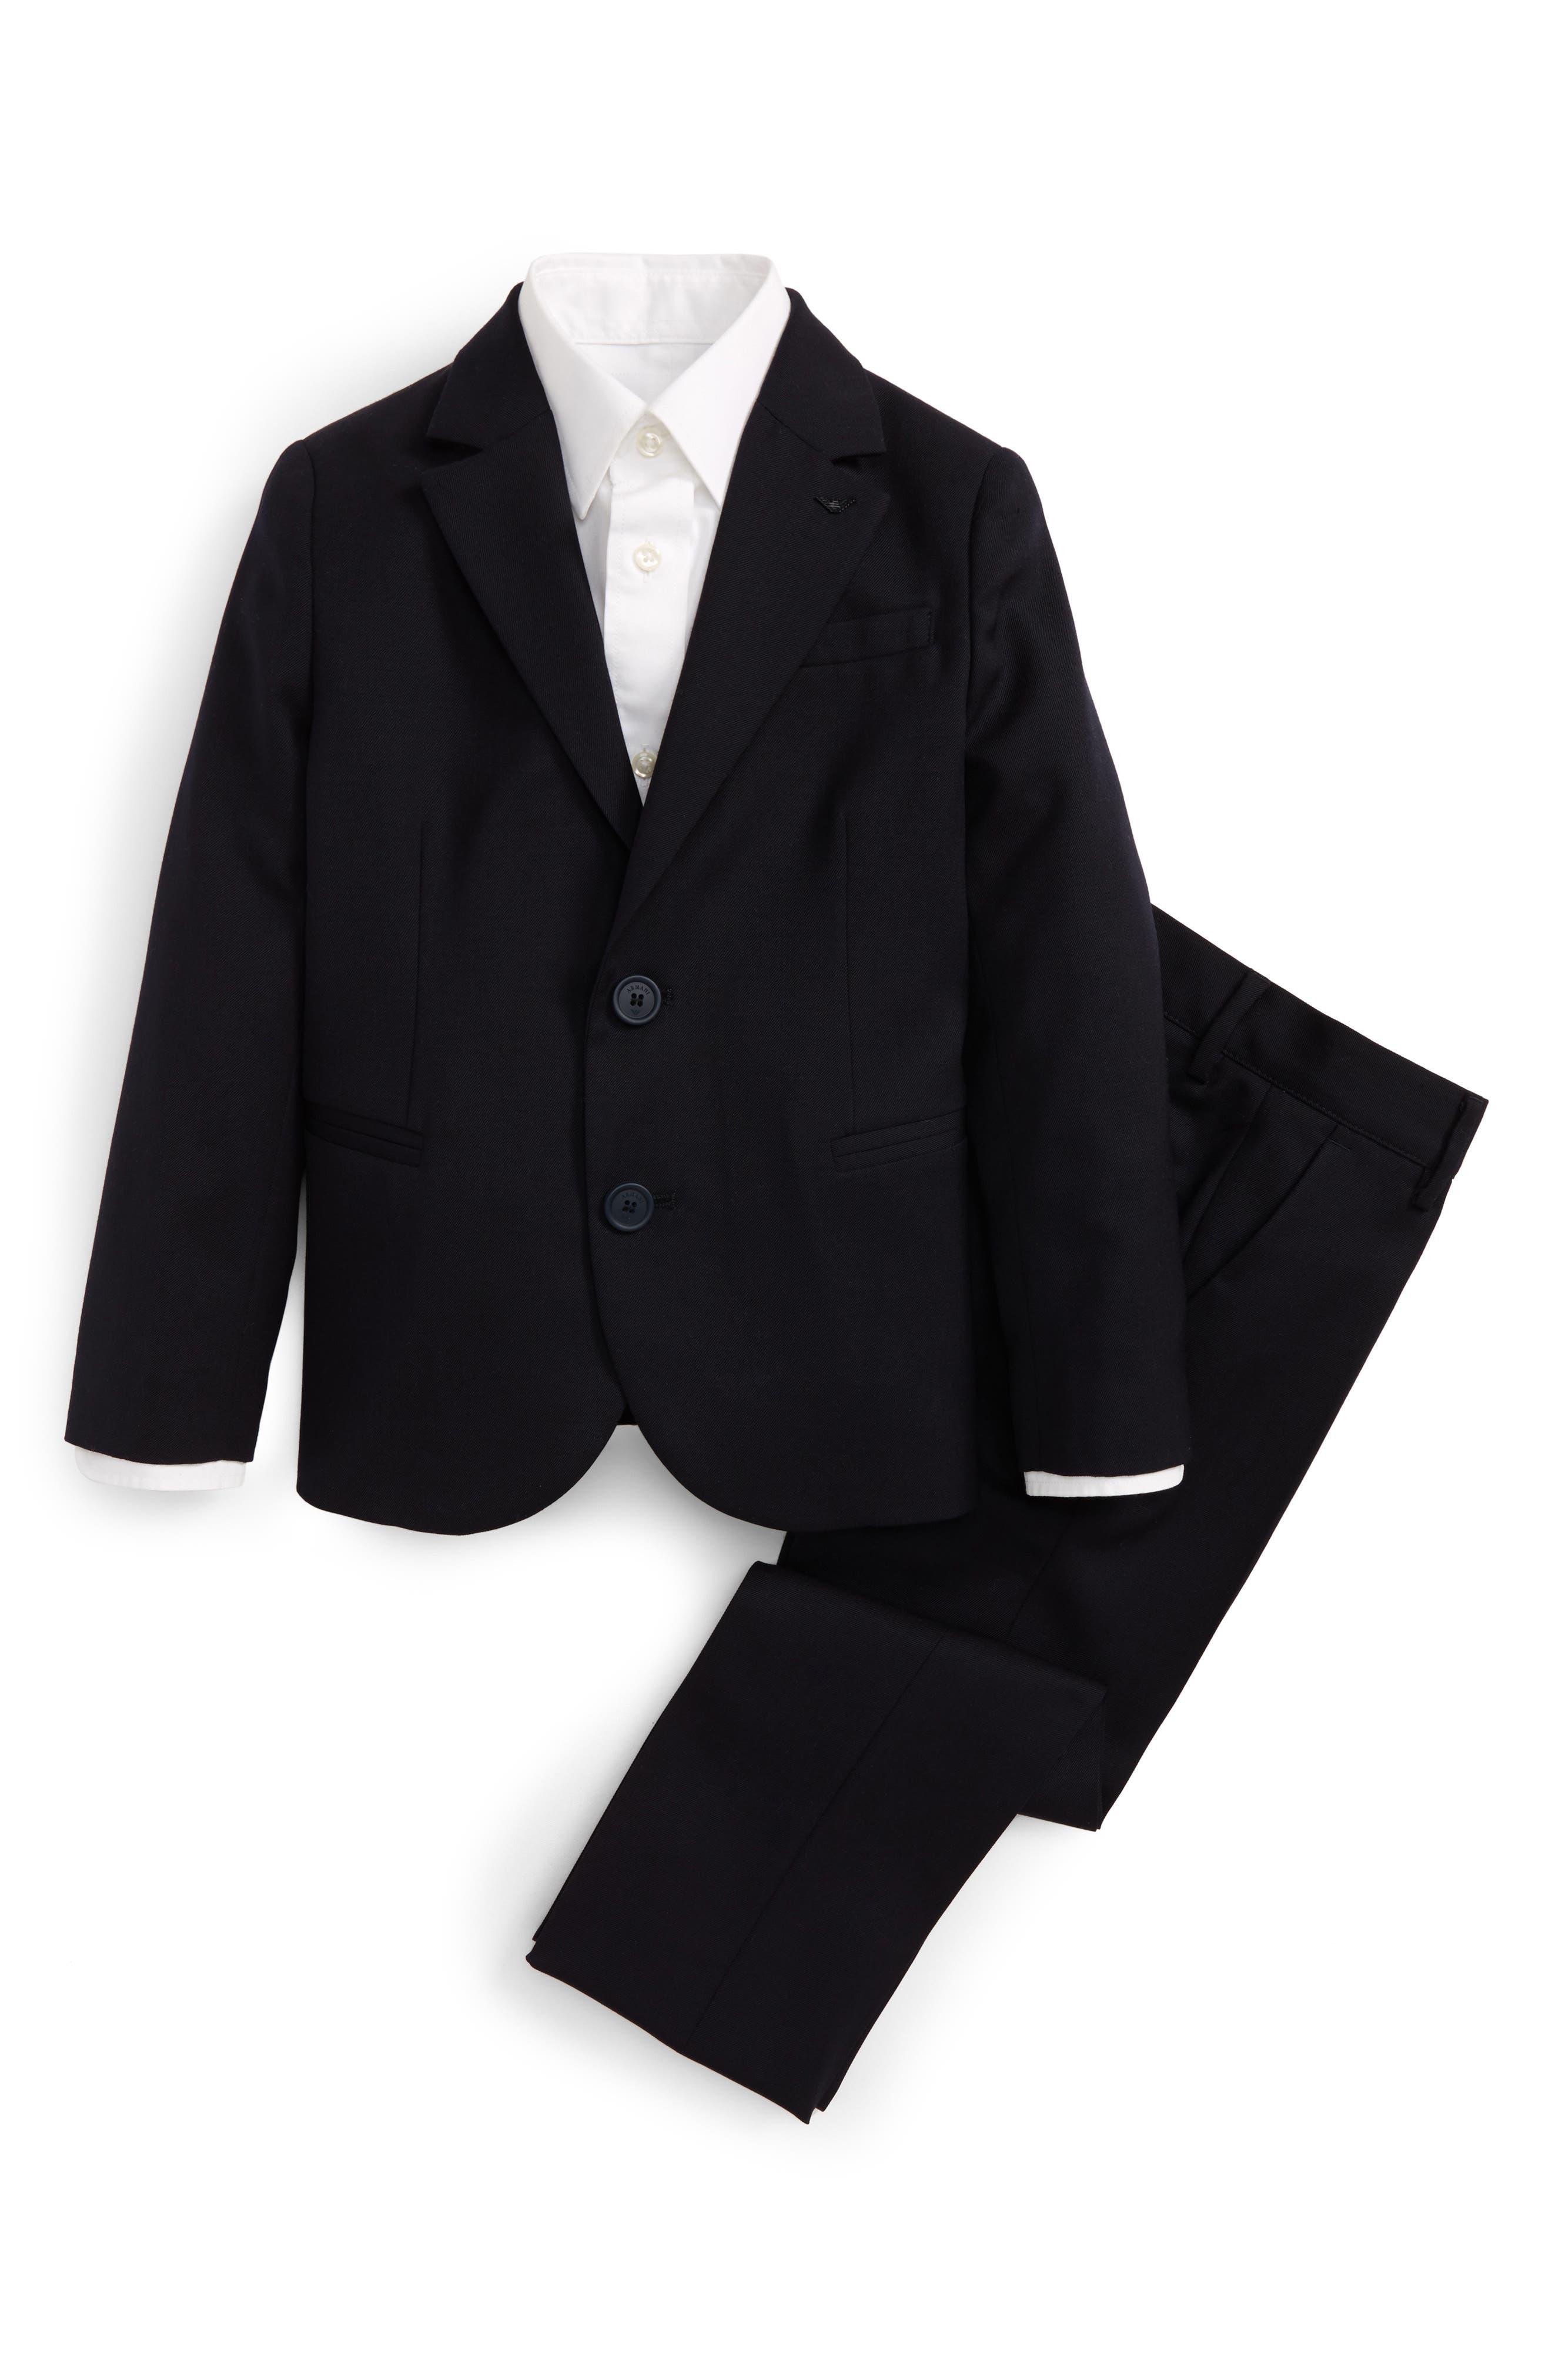 ARMANI JUNIOR Wool Suit